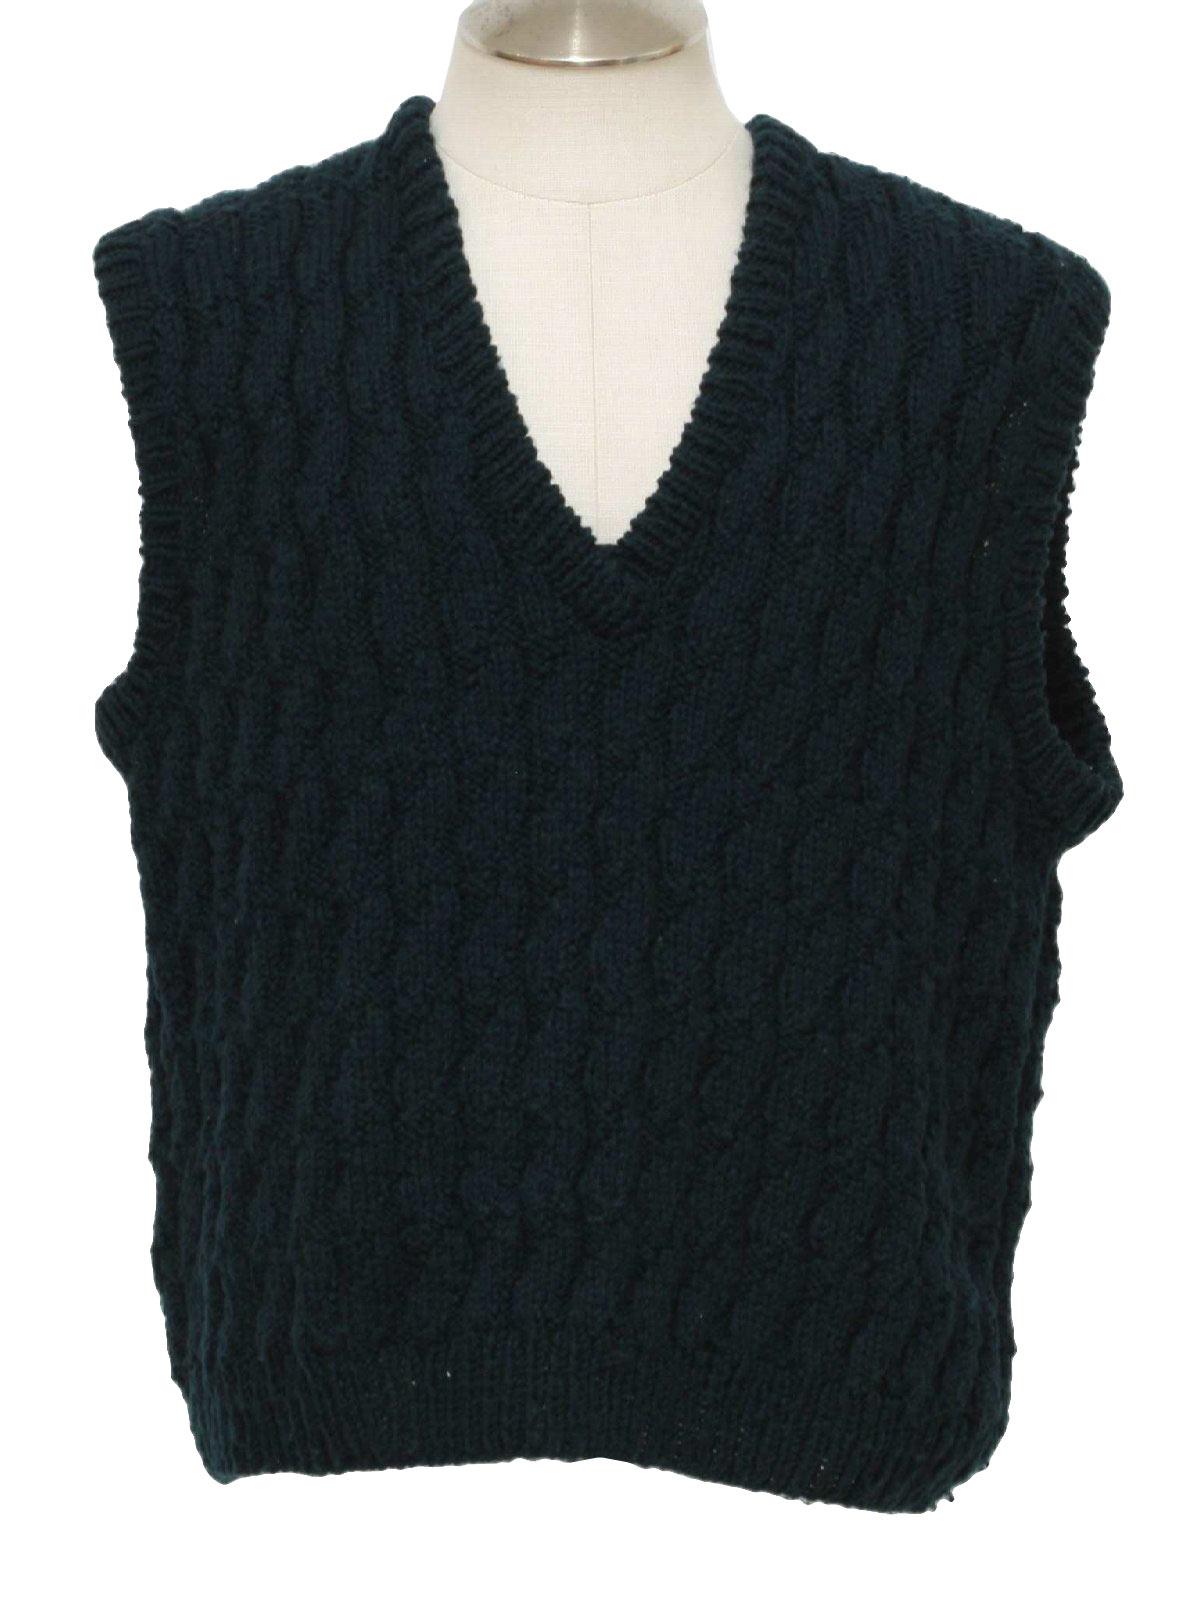 Vintage 1990's Sweater: 90s -No Label- Mens deep emerald green ...